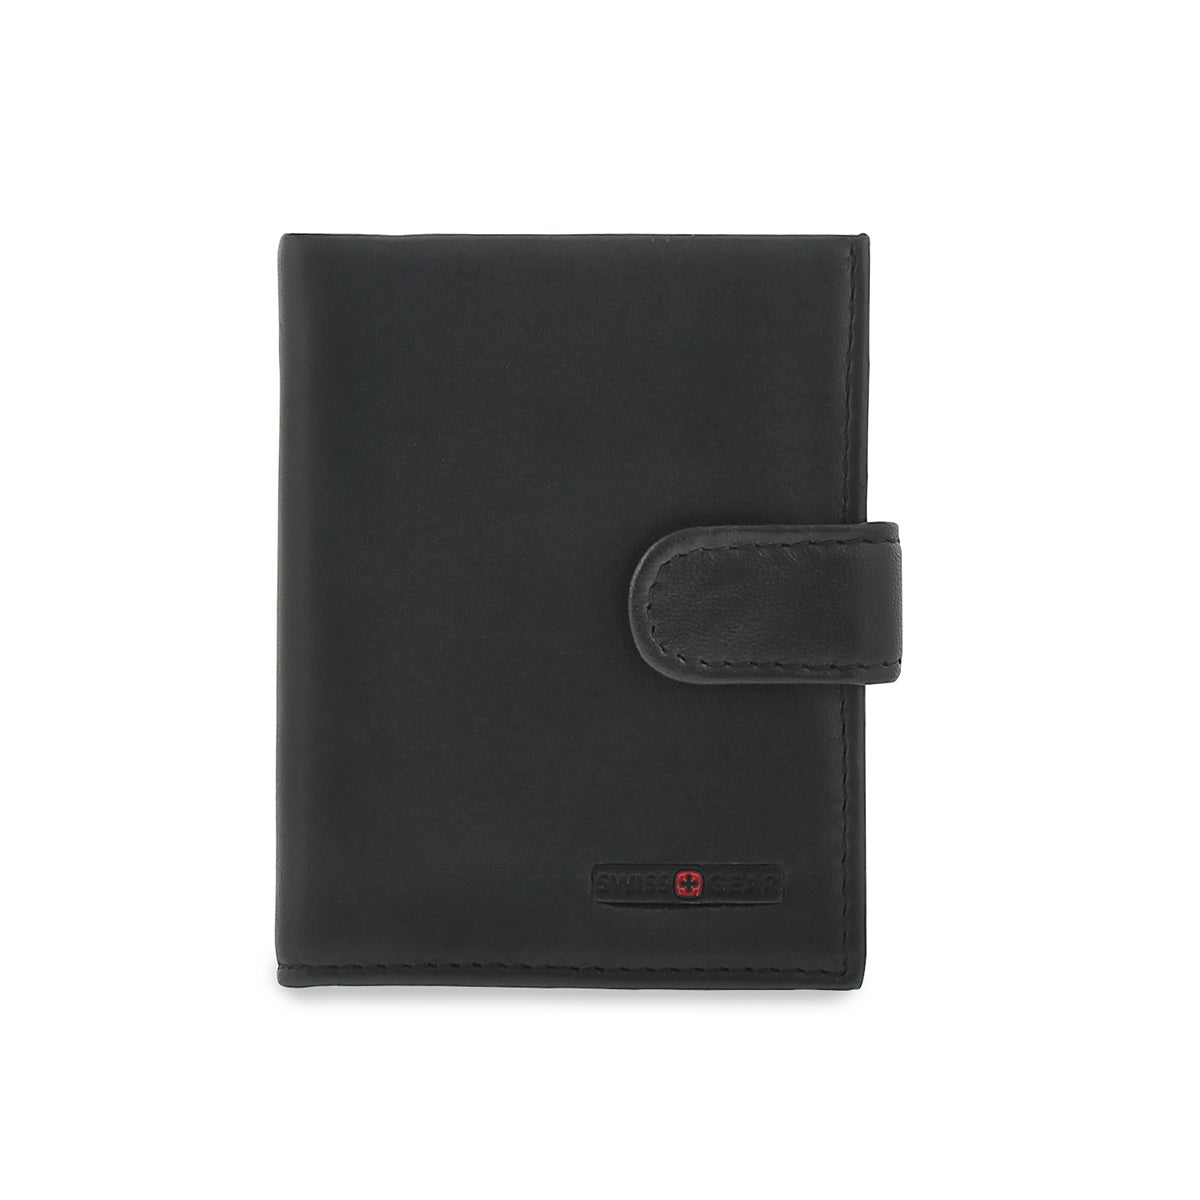 Mns black snap shut card case